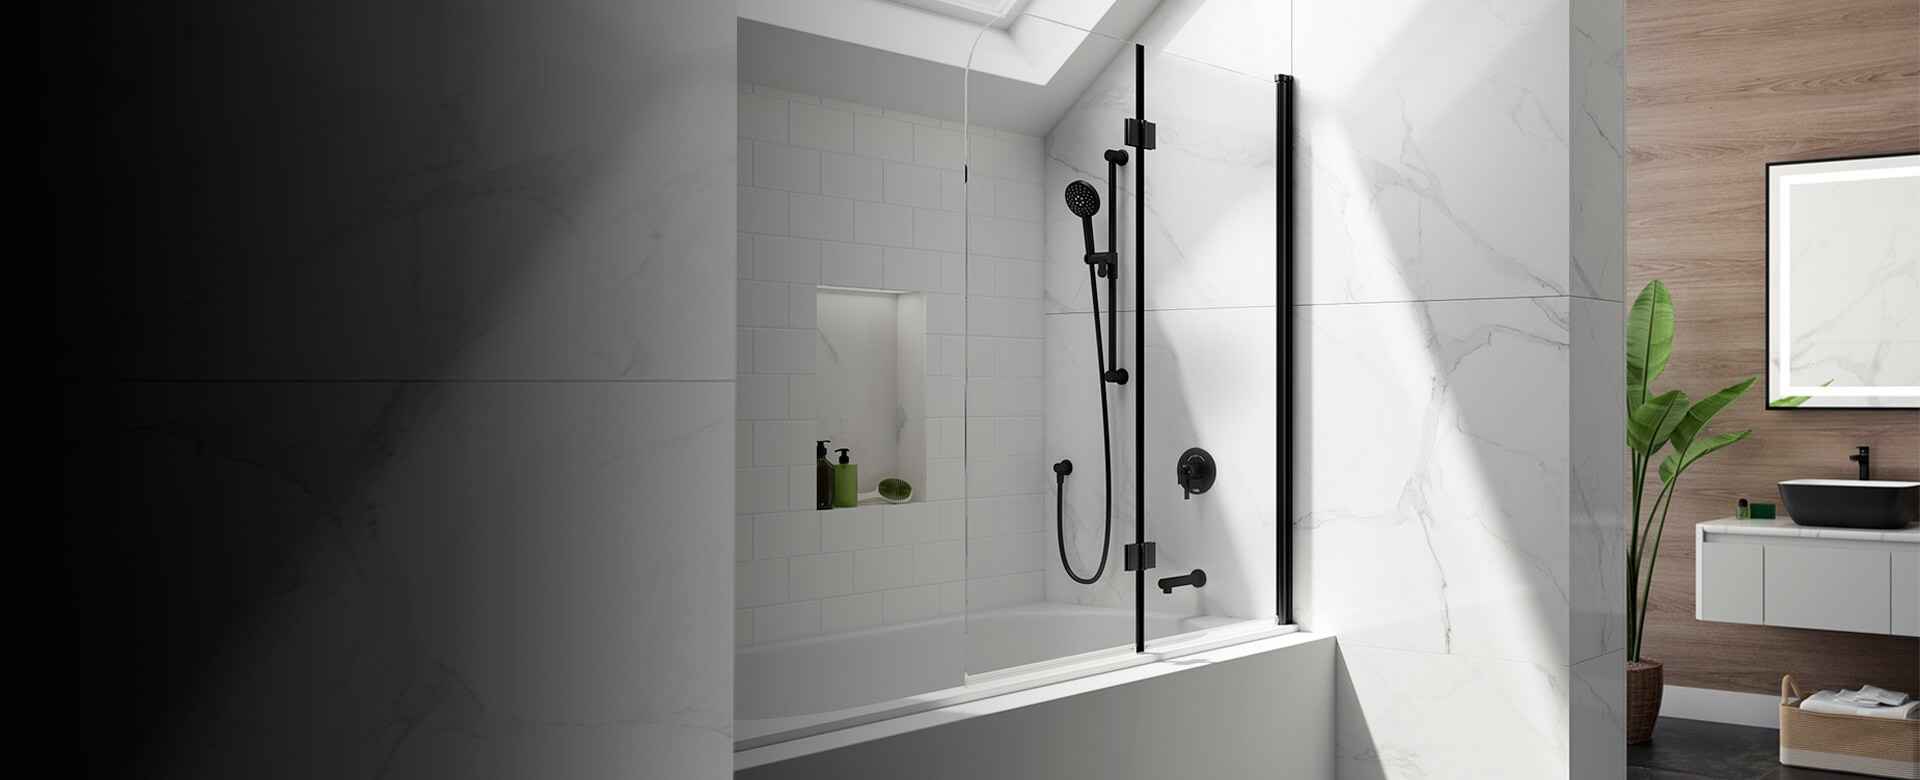 porte de douche flip noir mat